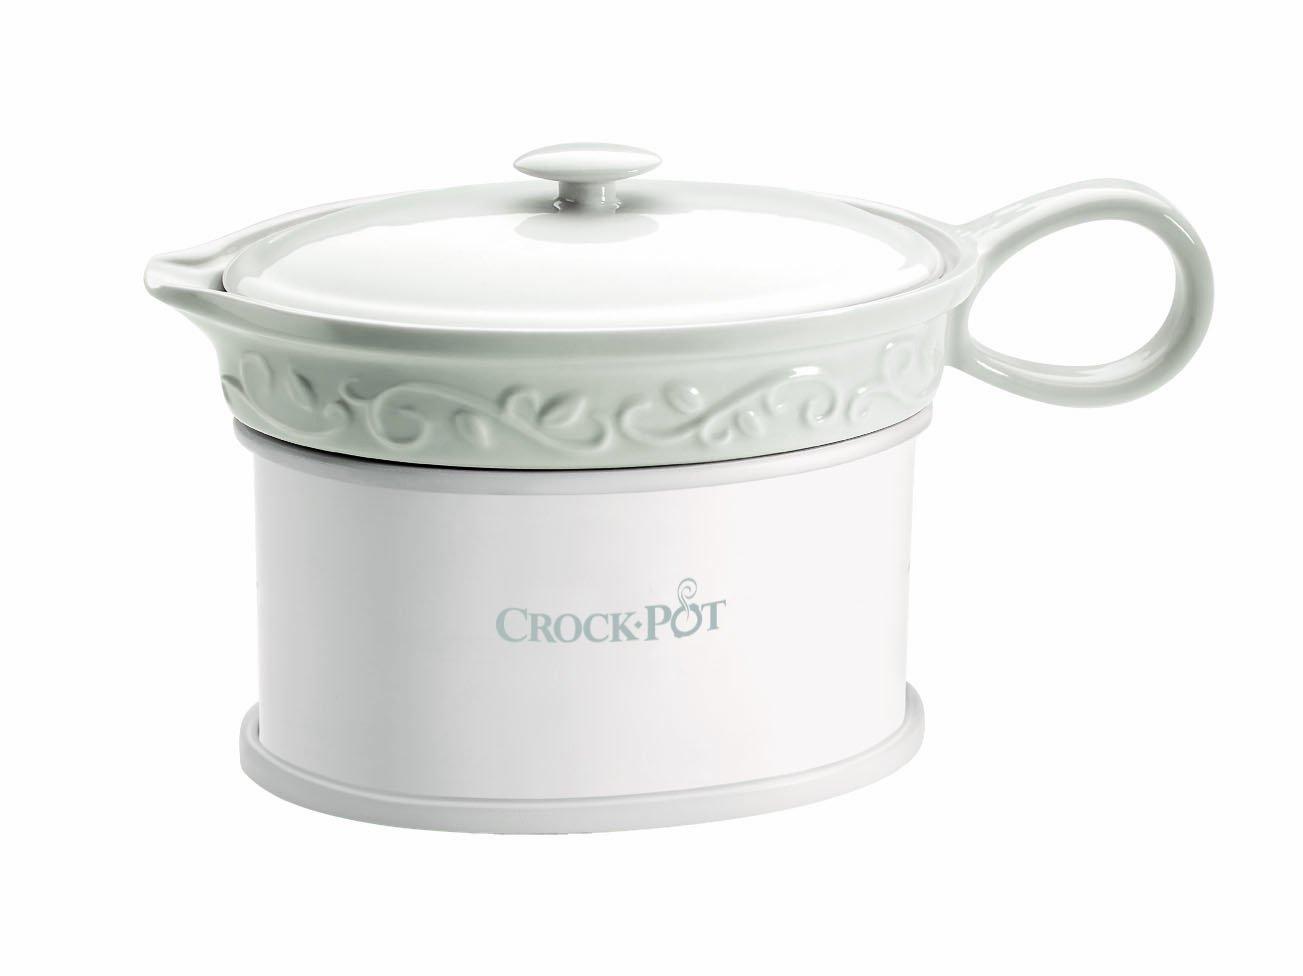 Crock-Pot SCCPVG000 18-Ounce Electric Gravy Warmer, White by Crock-Pot (Image #1)